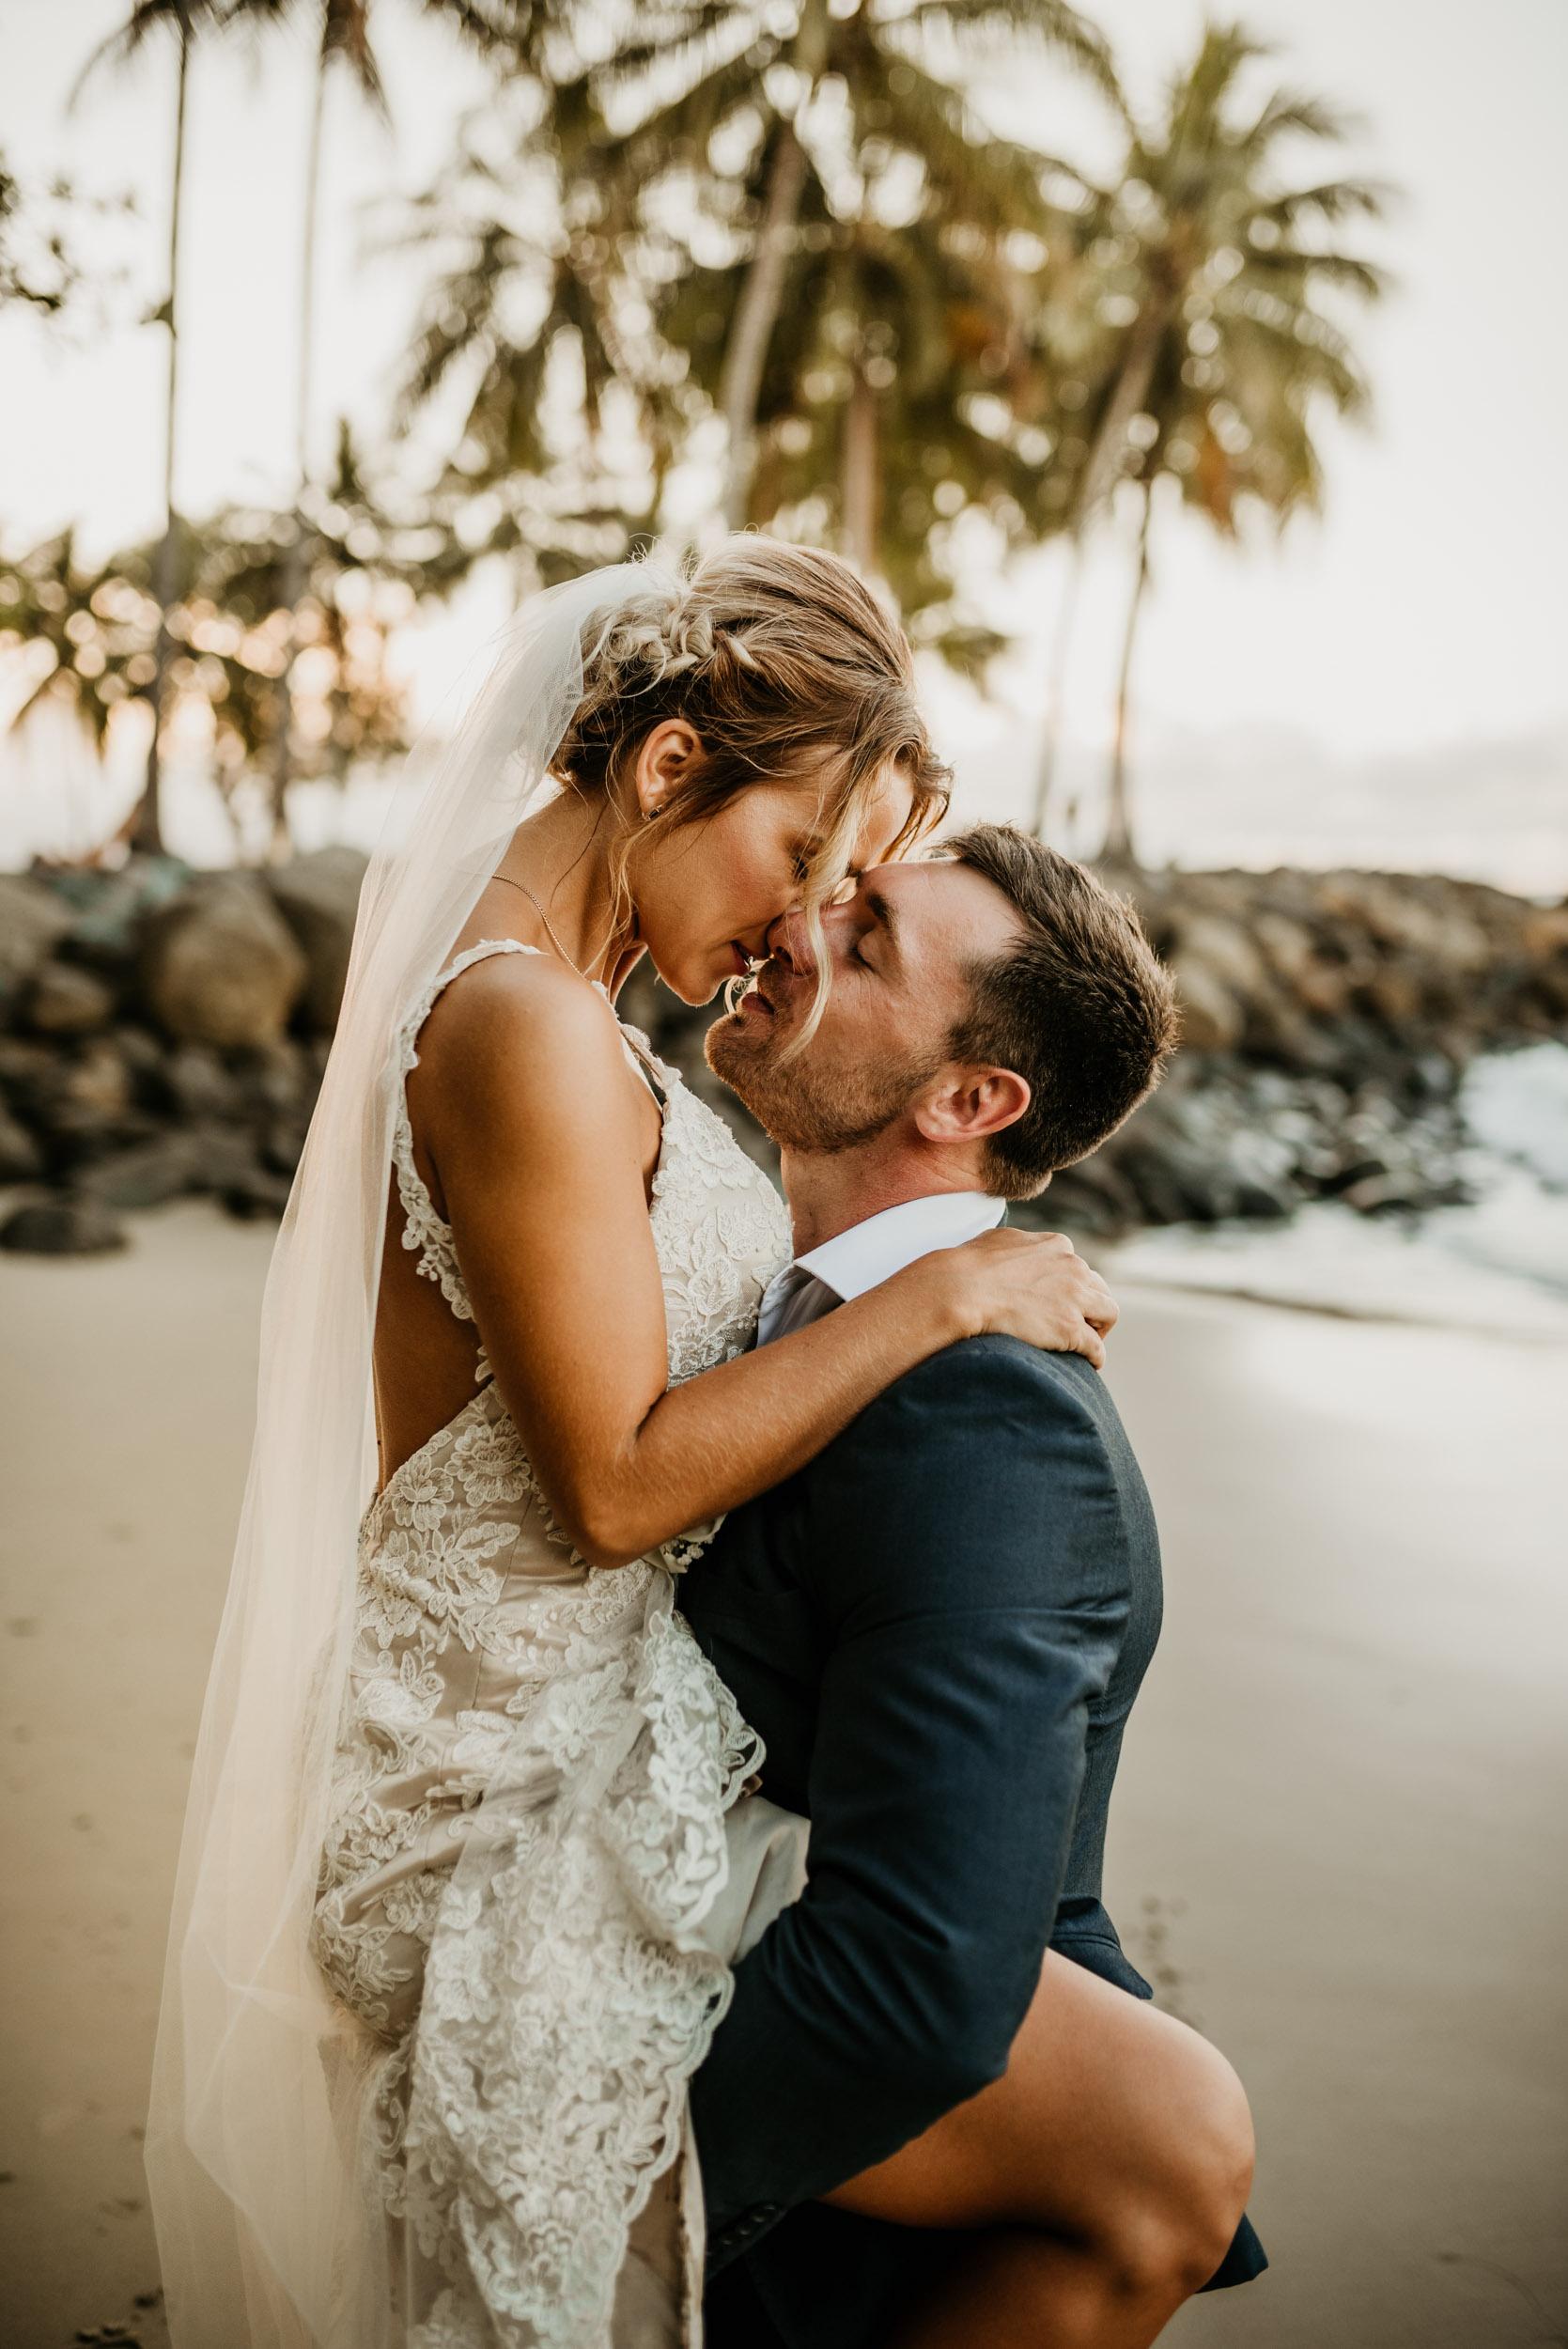 The Raw Photographer - Cairns and Port Douglas Wedding Photographer - Best of 2018-26.jpg